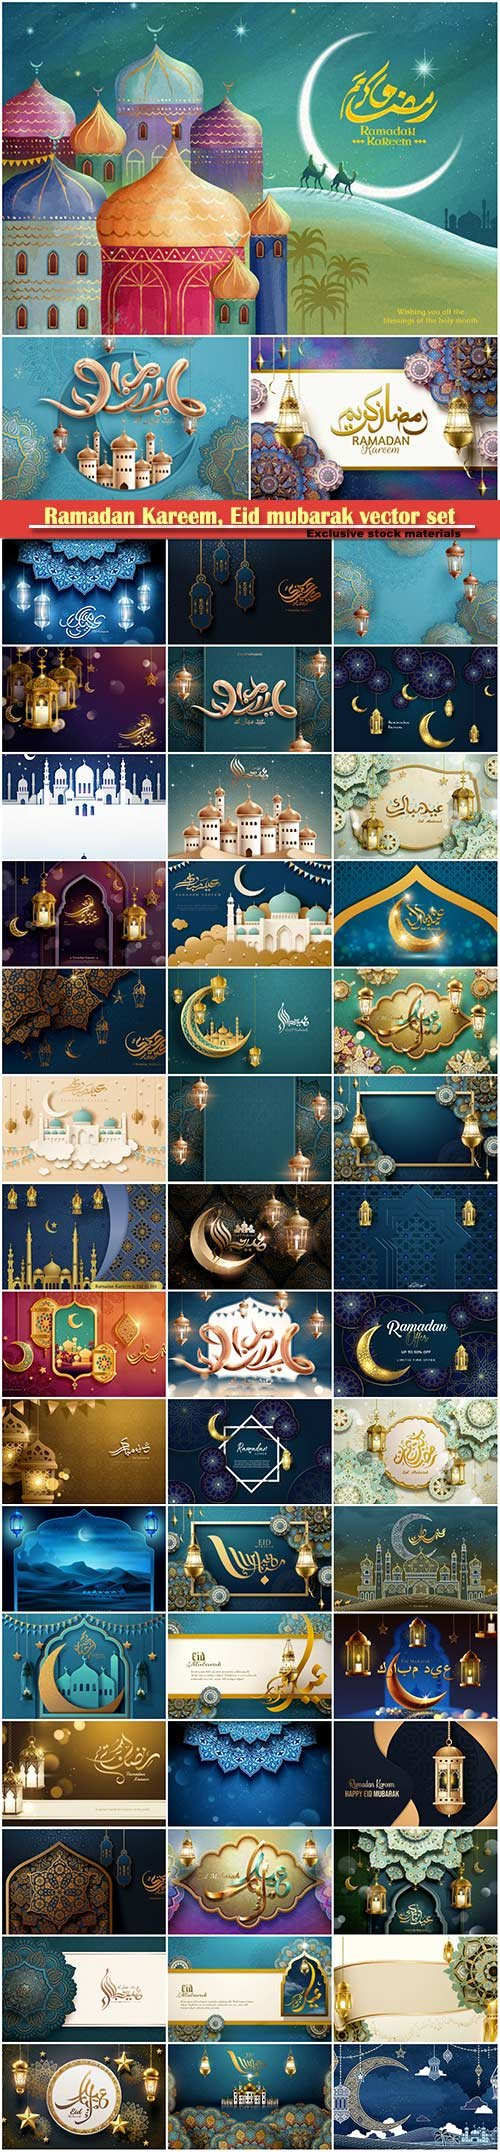 Ramadan Kareem, Eid mubarak vector set # 3